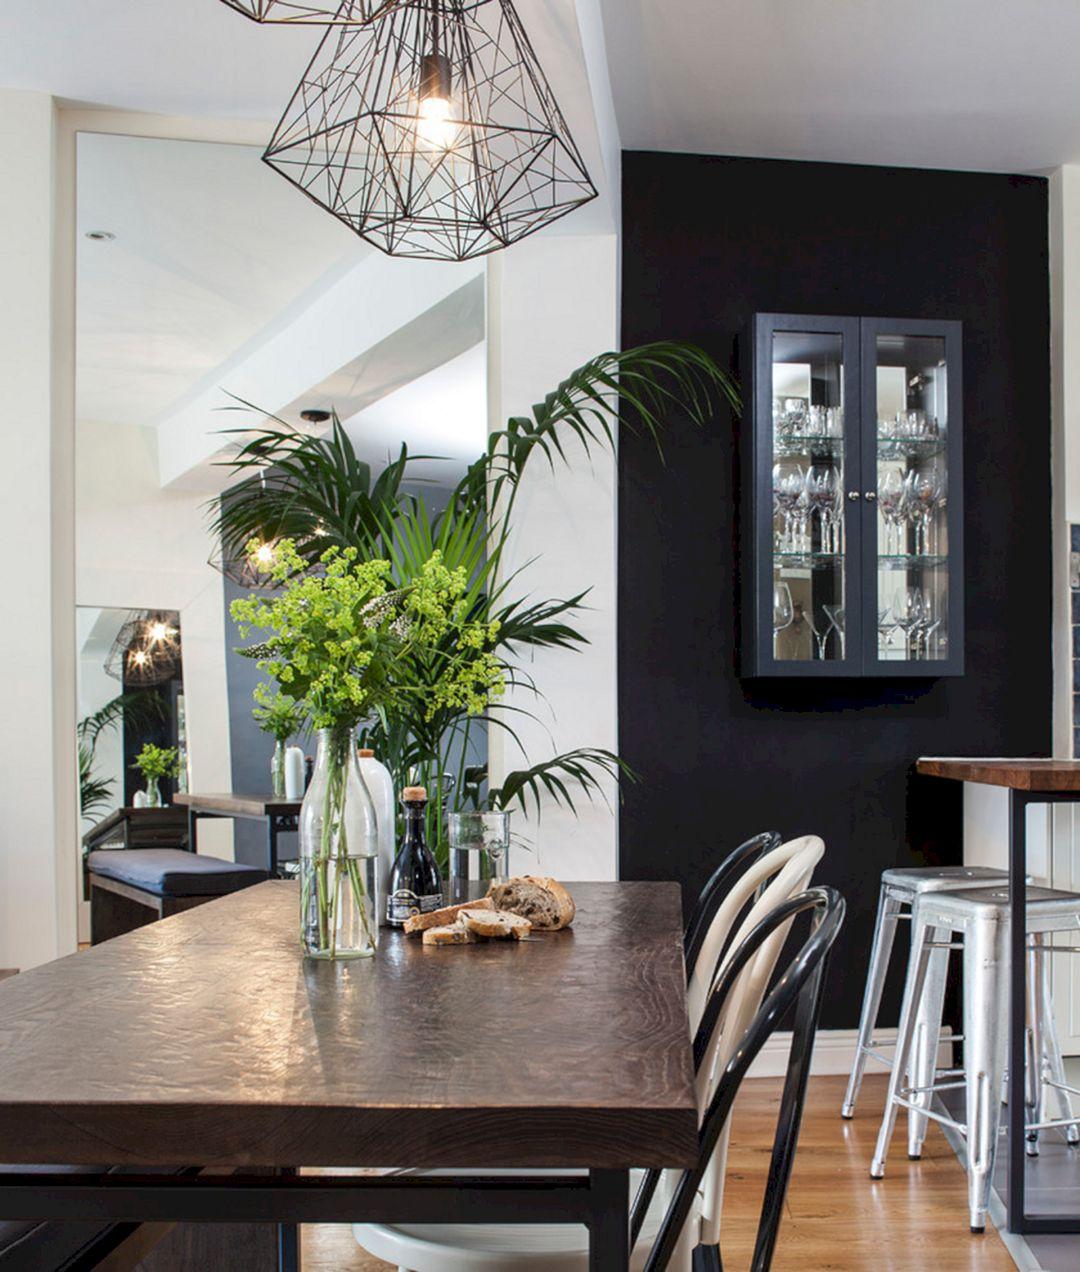 Dining Rooms Dining Room Lighting Ideas And Arrangements: Dining Room Lighting Ideas 20 (Dining Room Lighting Ideas